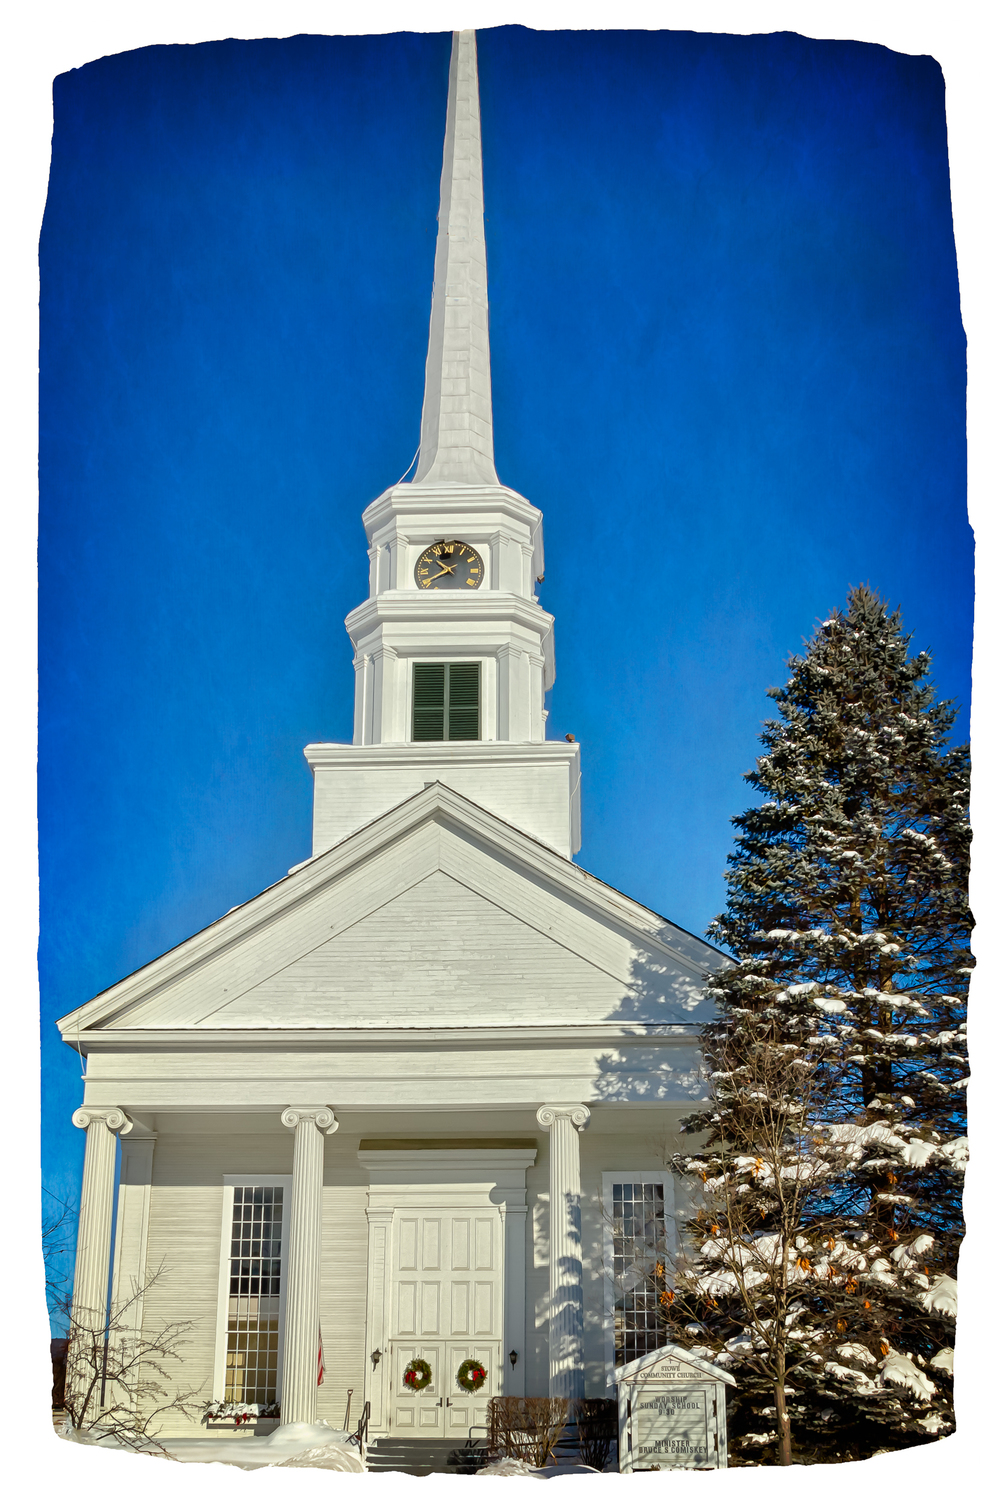 20130103_Stowe, Vermont__MG_0891_HDR-Edit-Edit.jpg